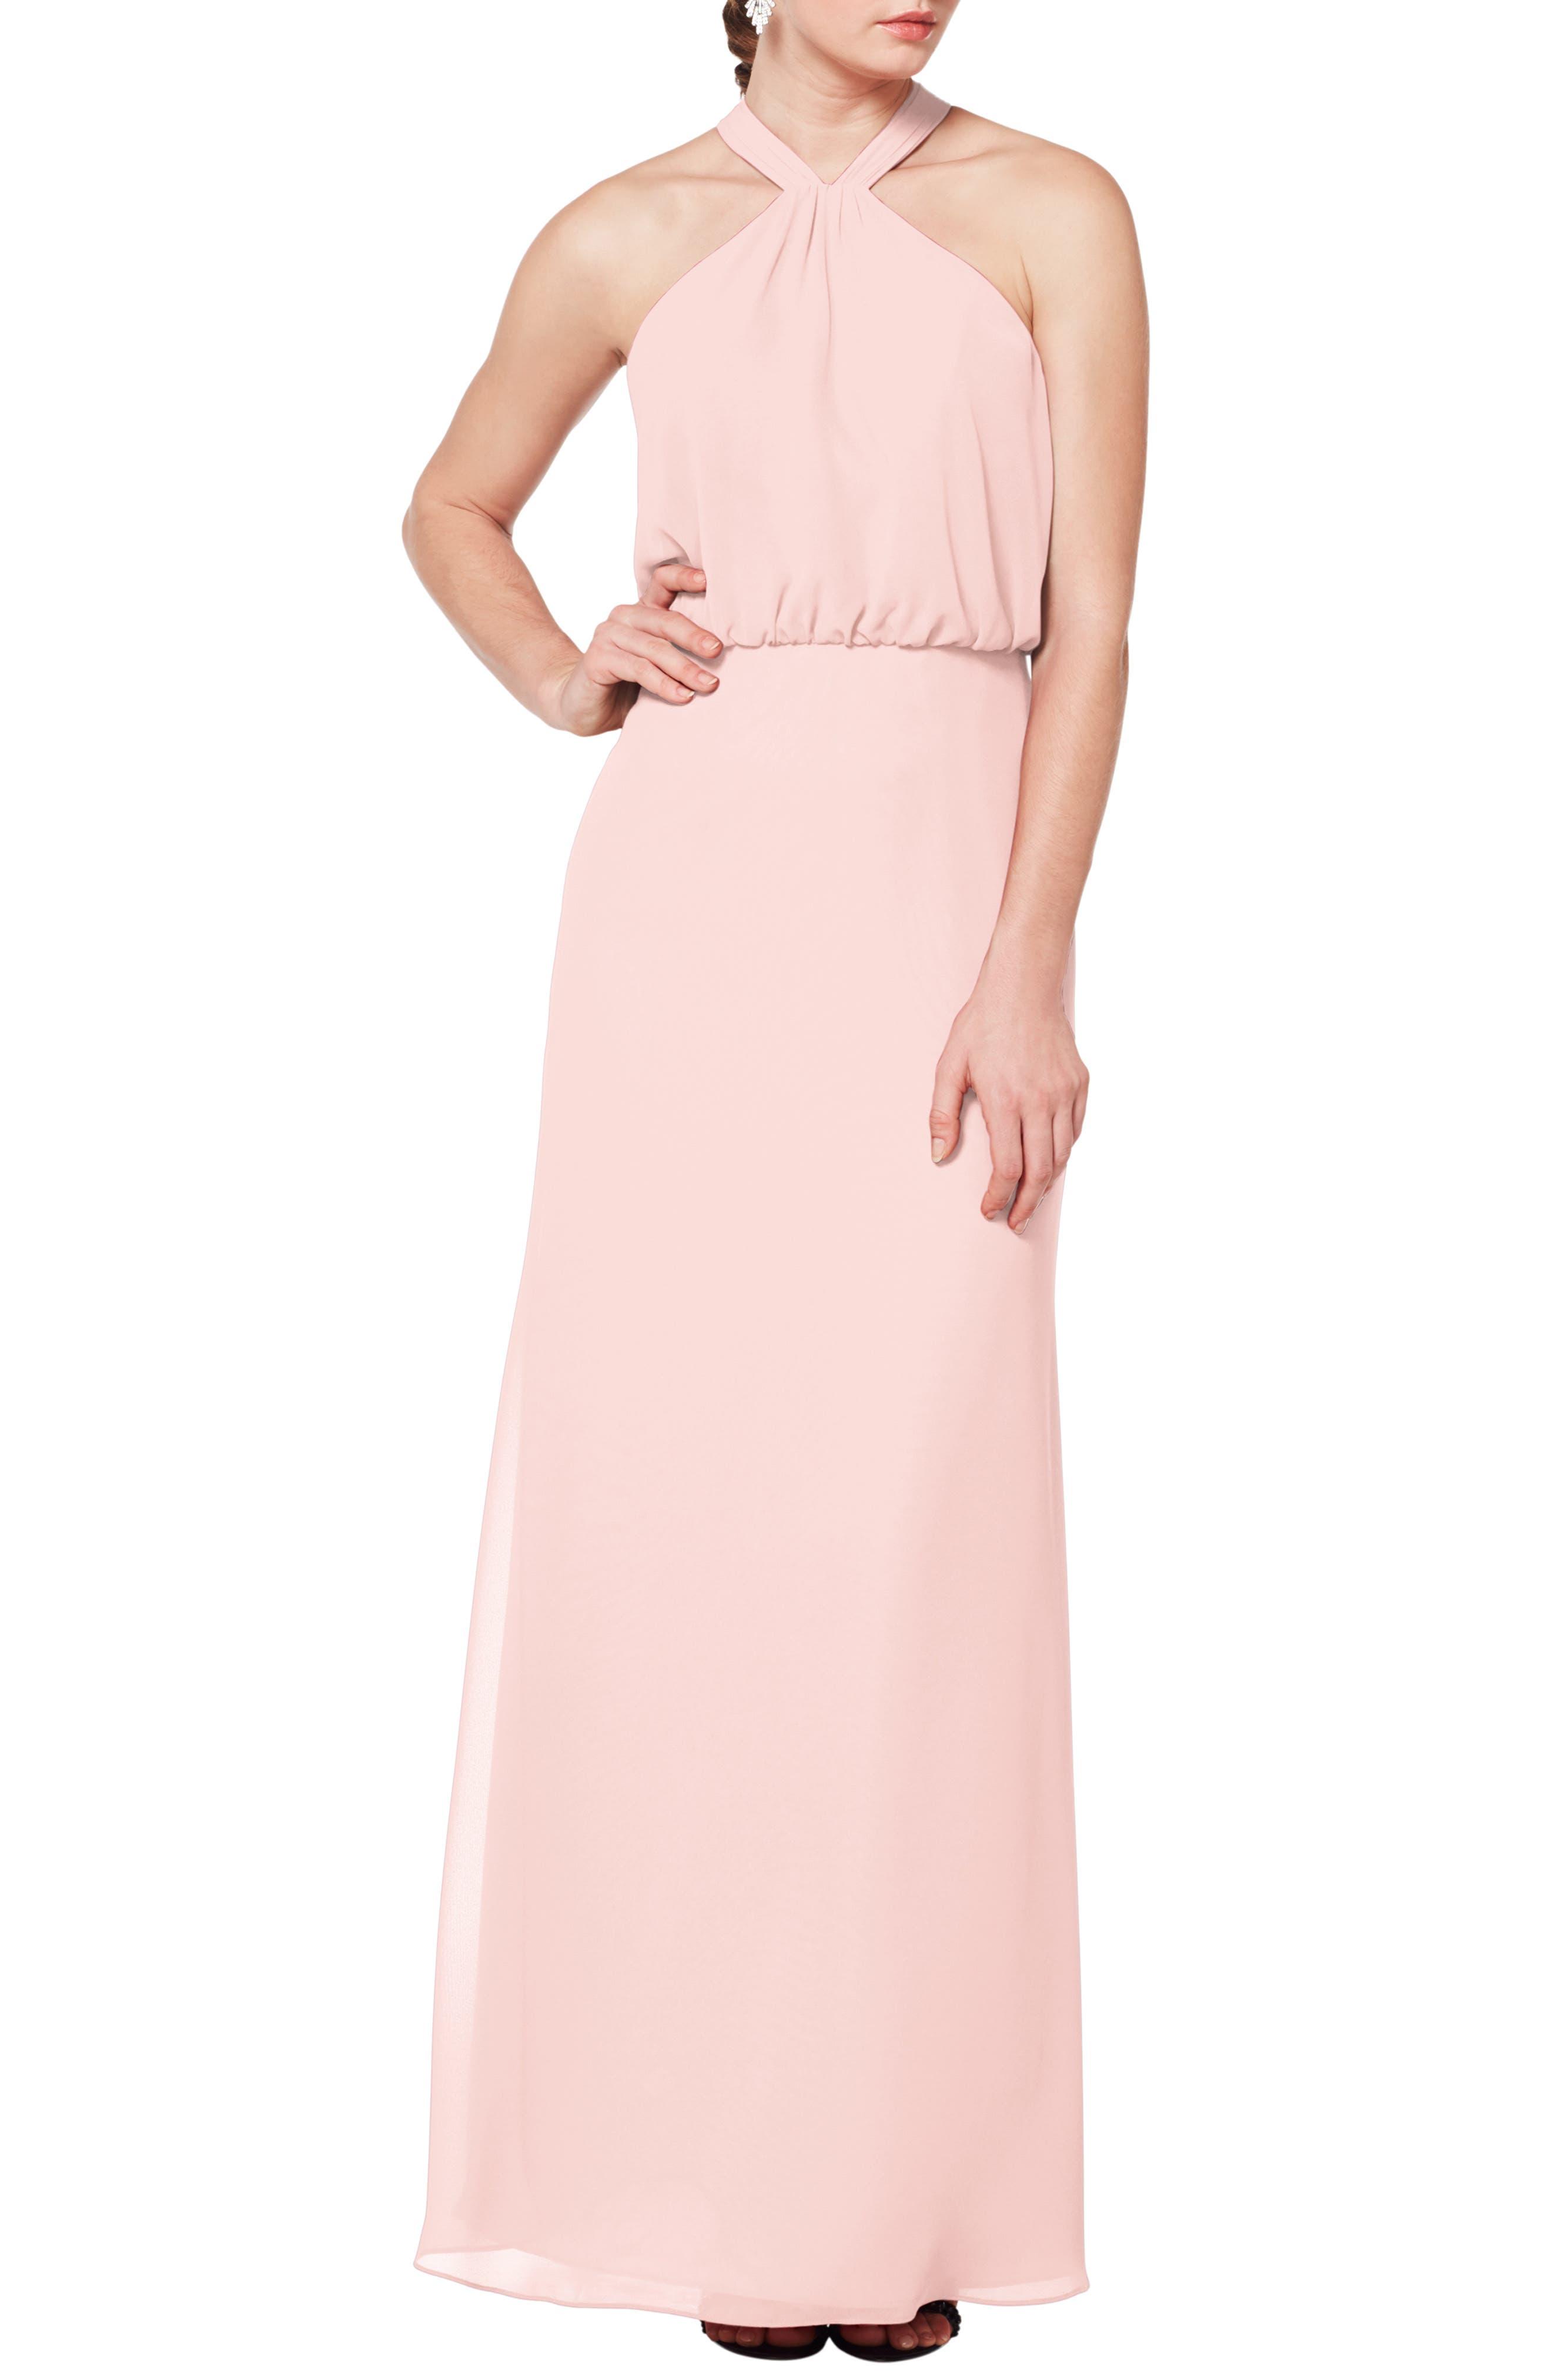 #levkoff Halter Neck Blouson Bodice Evening Dress, Pink